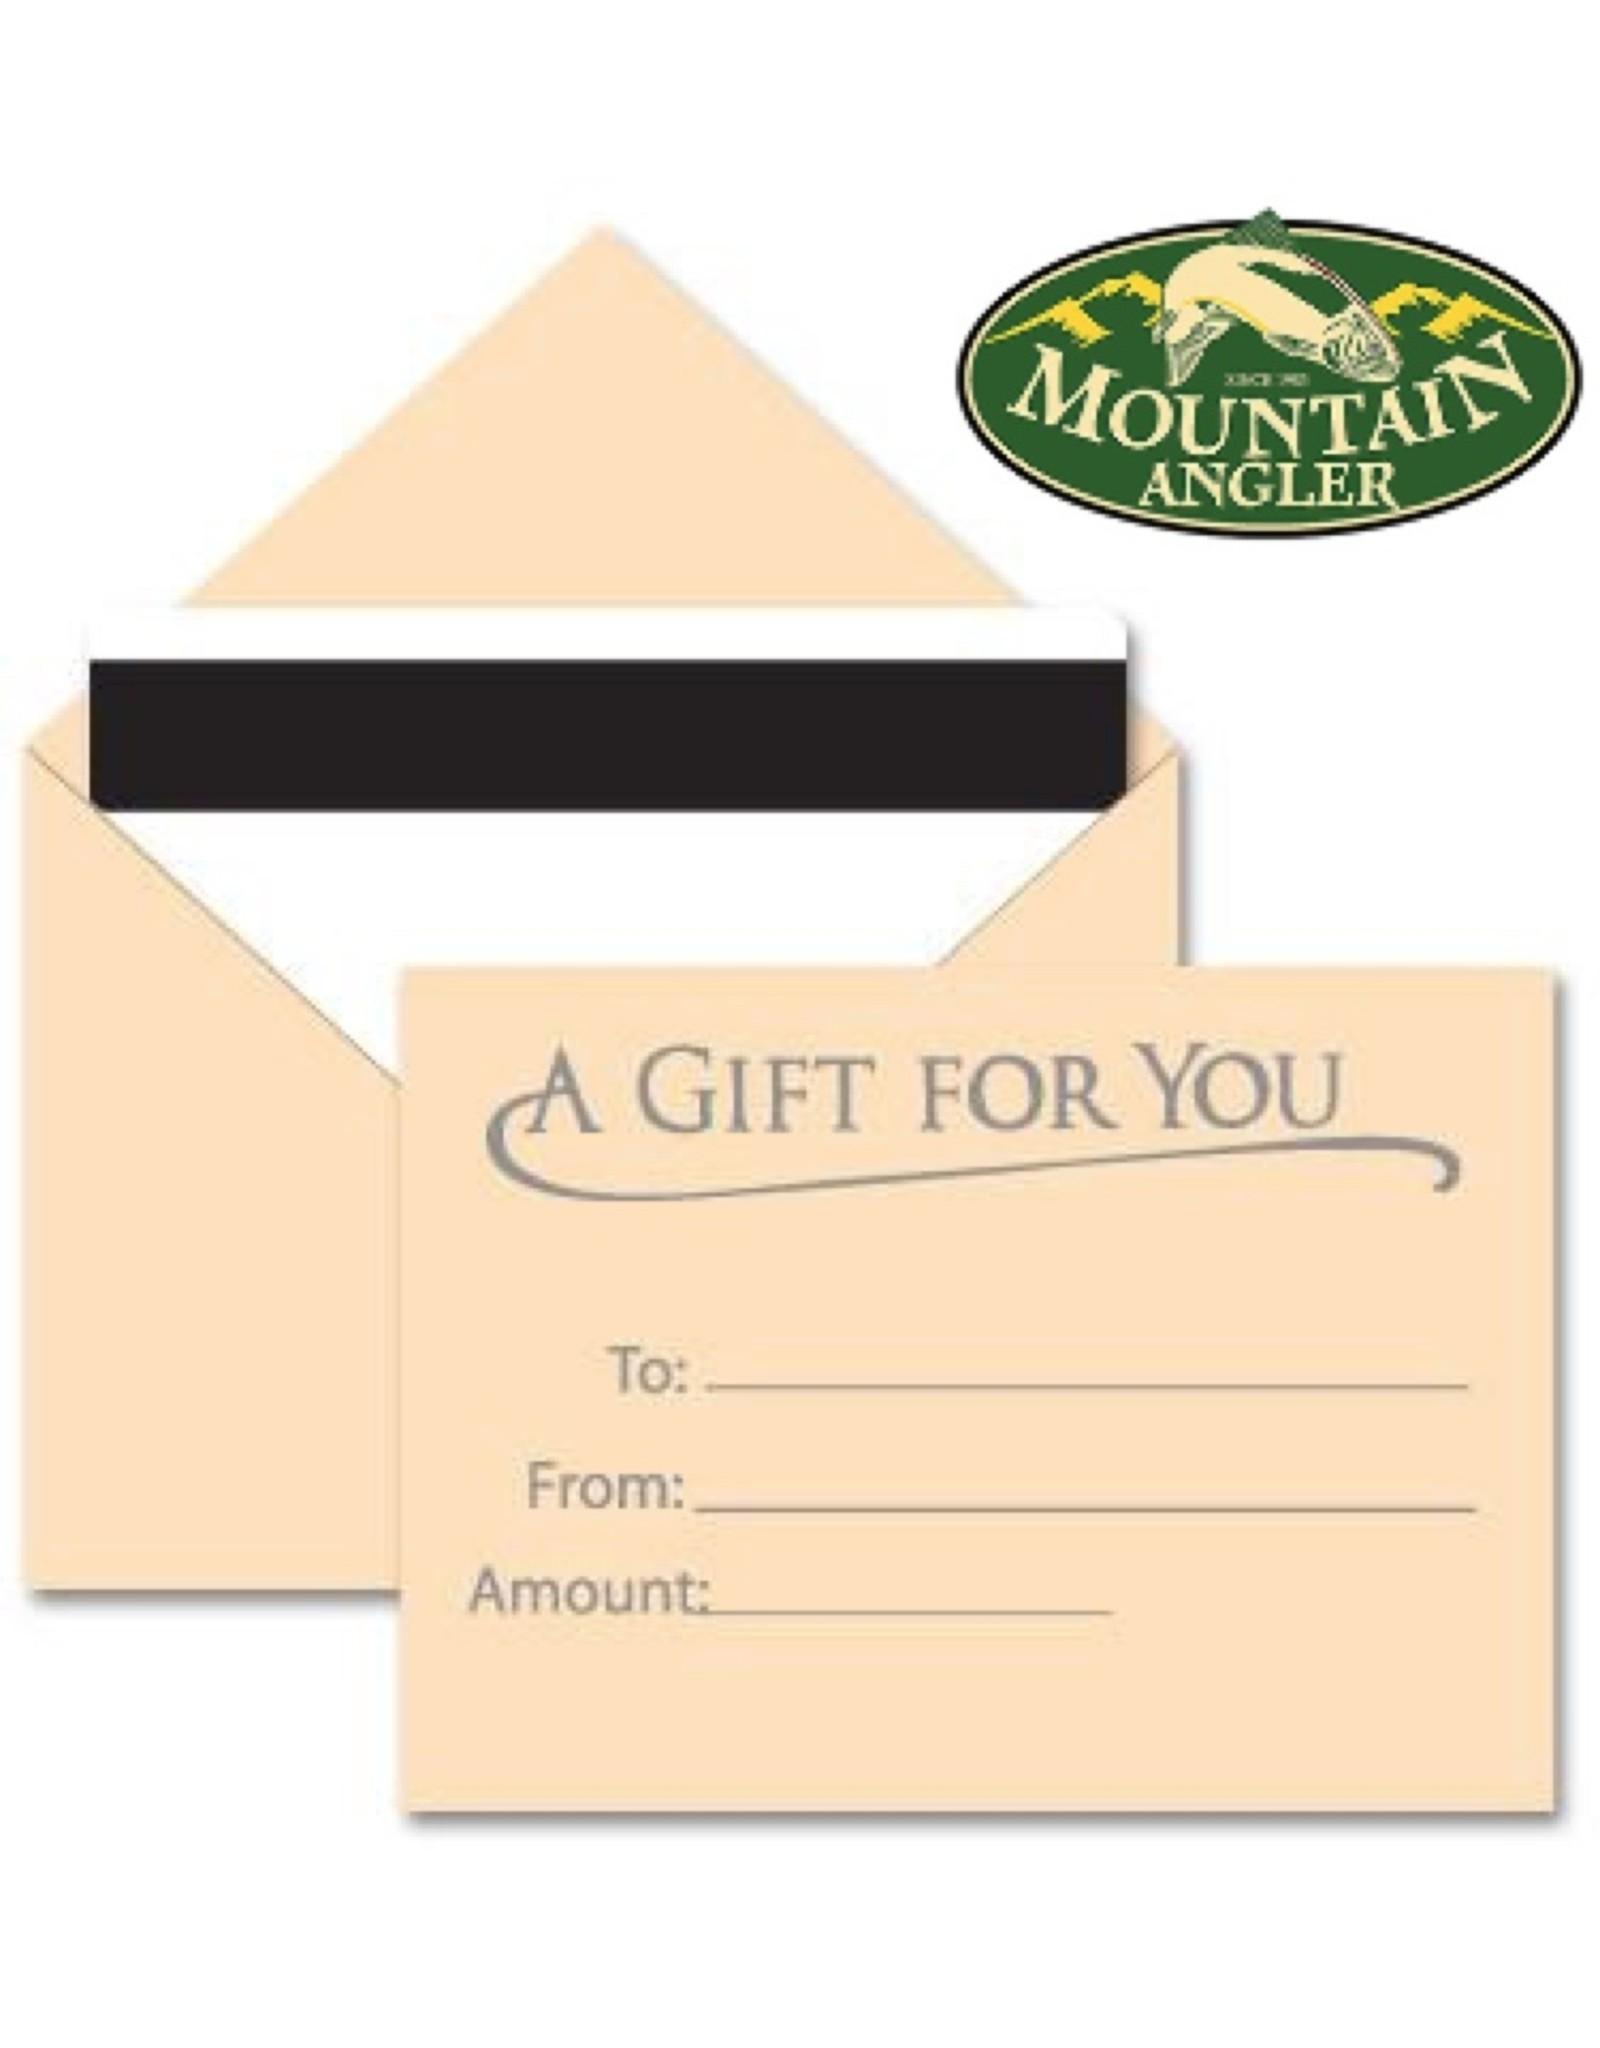 Mountain Angler - Gift Card